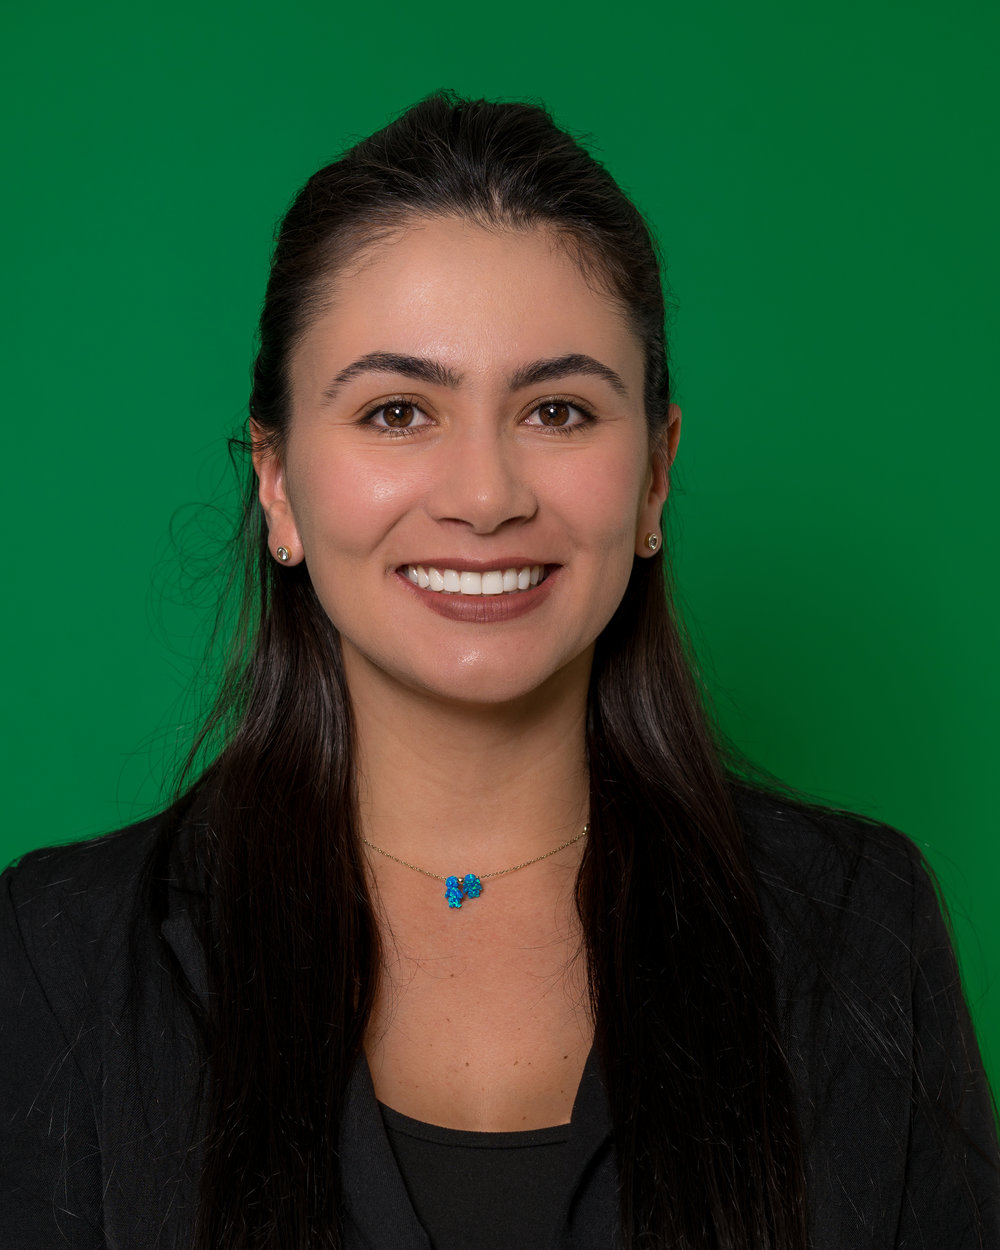 Andrea Sanchez - Loan Originator NMLS: 1153397